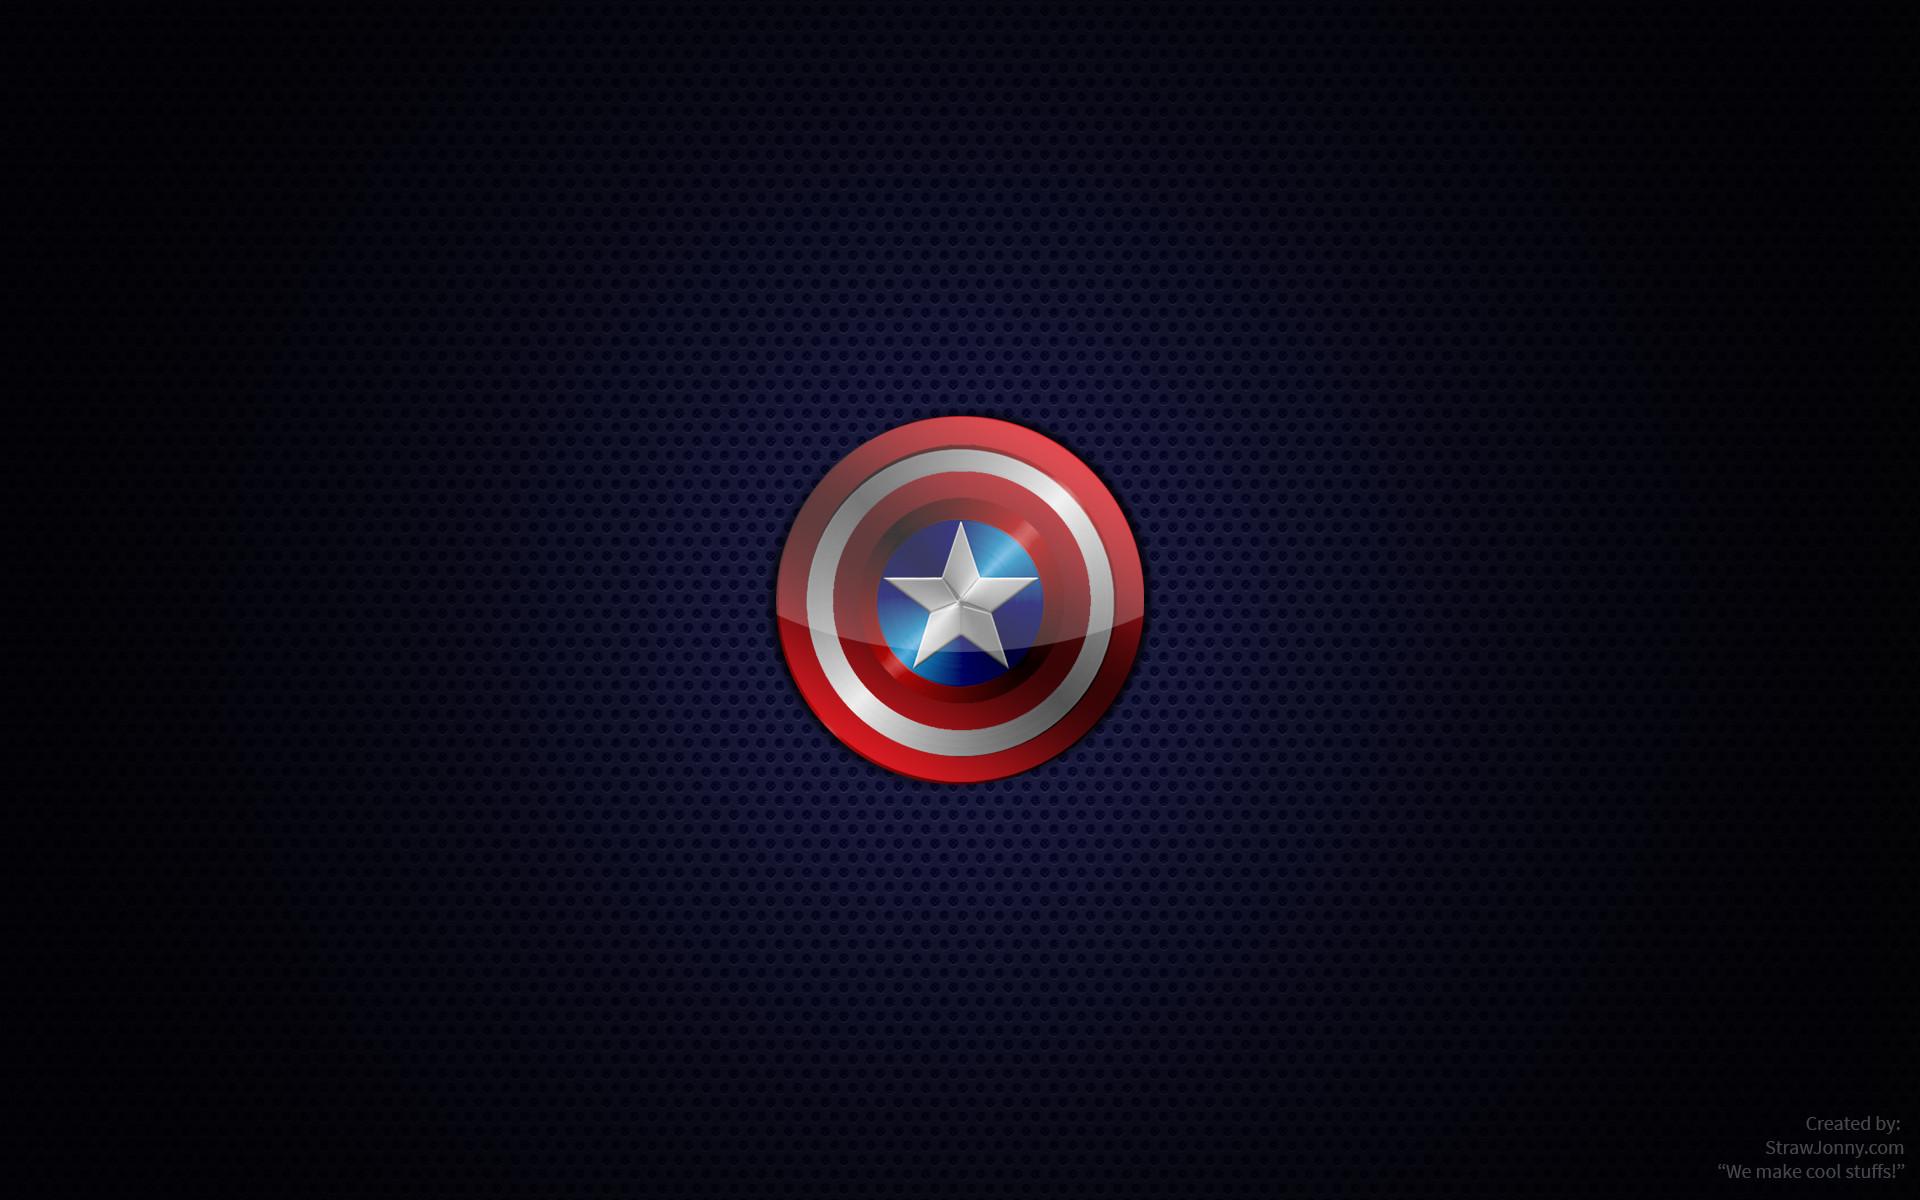 Captain America shield HD Wallpaper   Wallpapers   Pinterest   Captain  america shield and Hd wallpaper